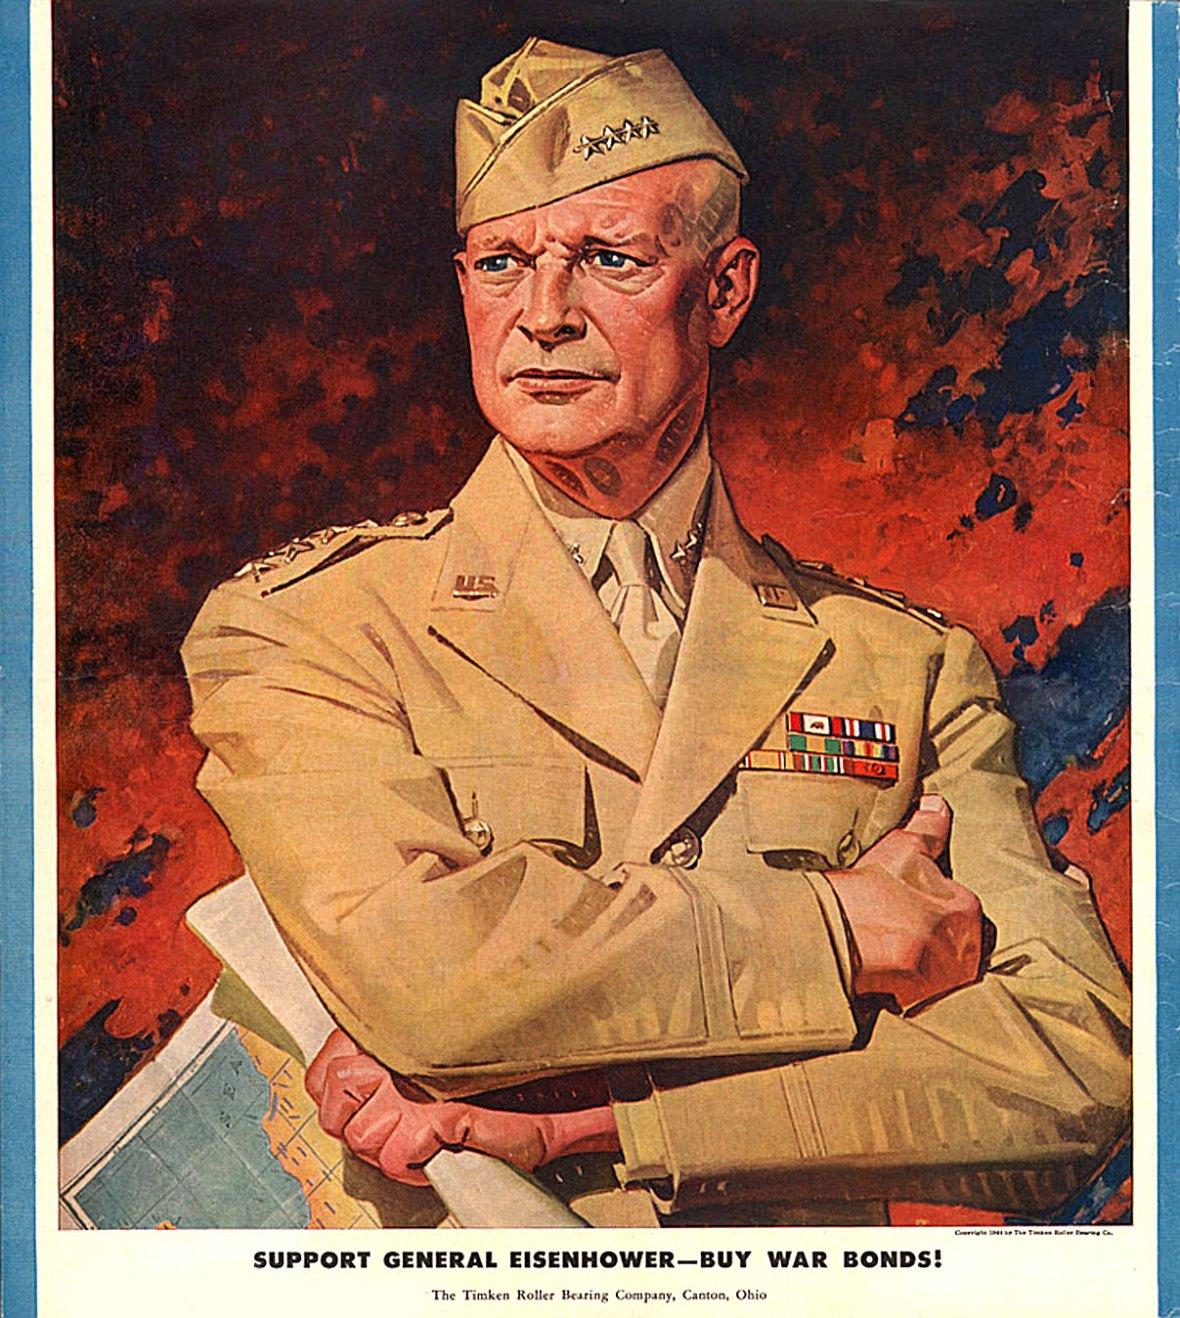 The Timken Roller Bearing Company - 'Buy War Bonds' featuring General Dwight D. Eisenhower - 1944